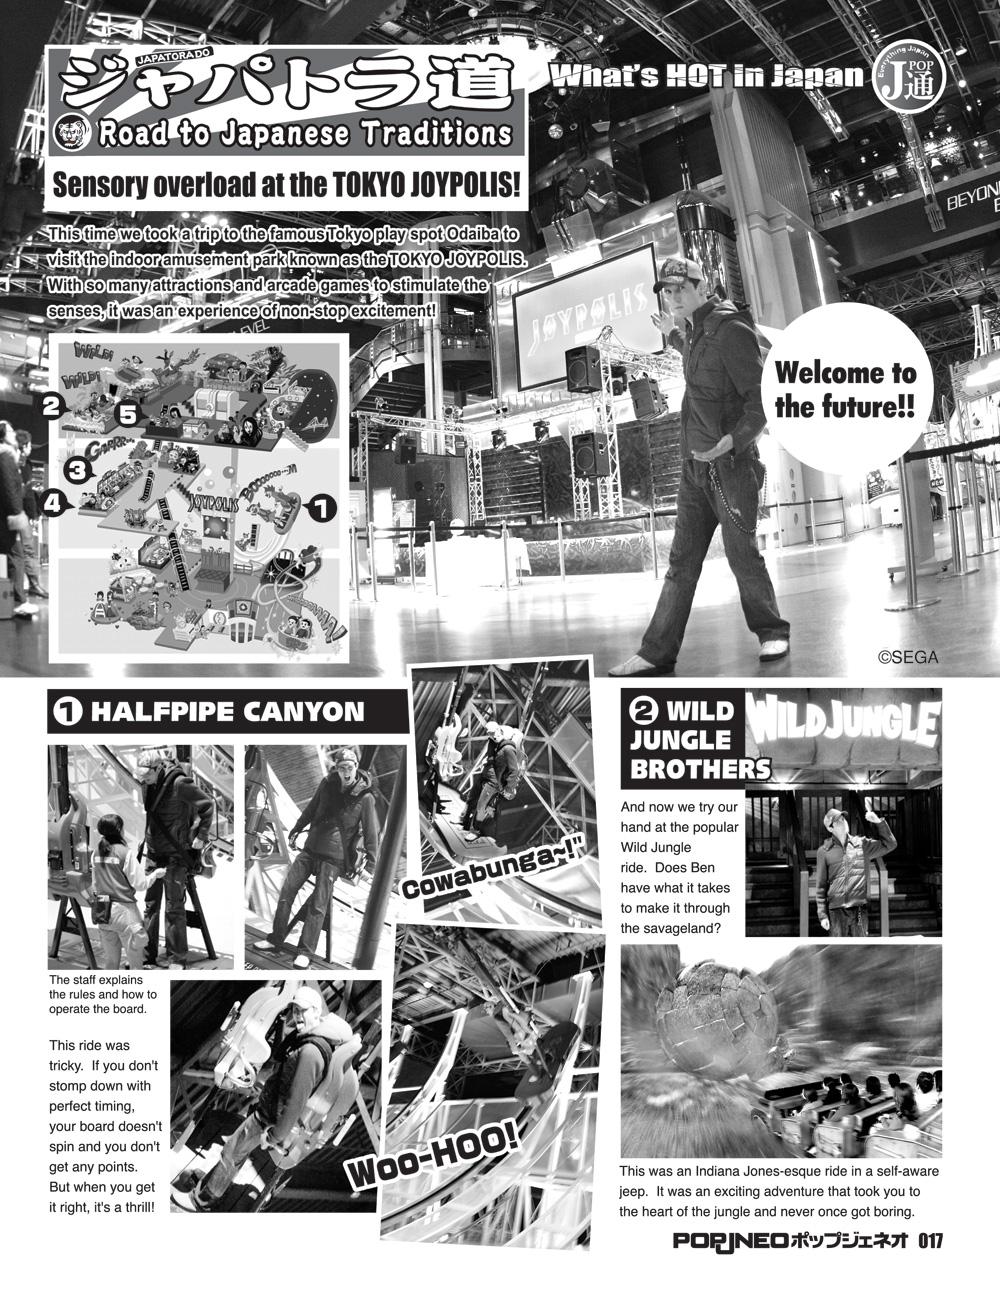 Sensory overload at the TOKYO JOYPOLIS!